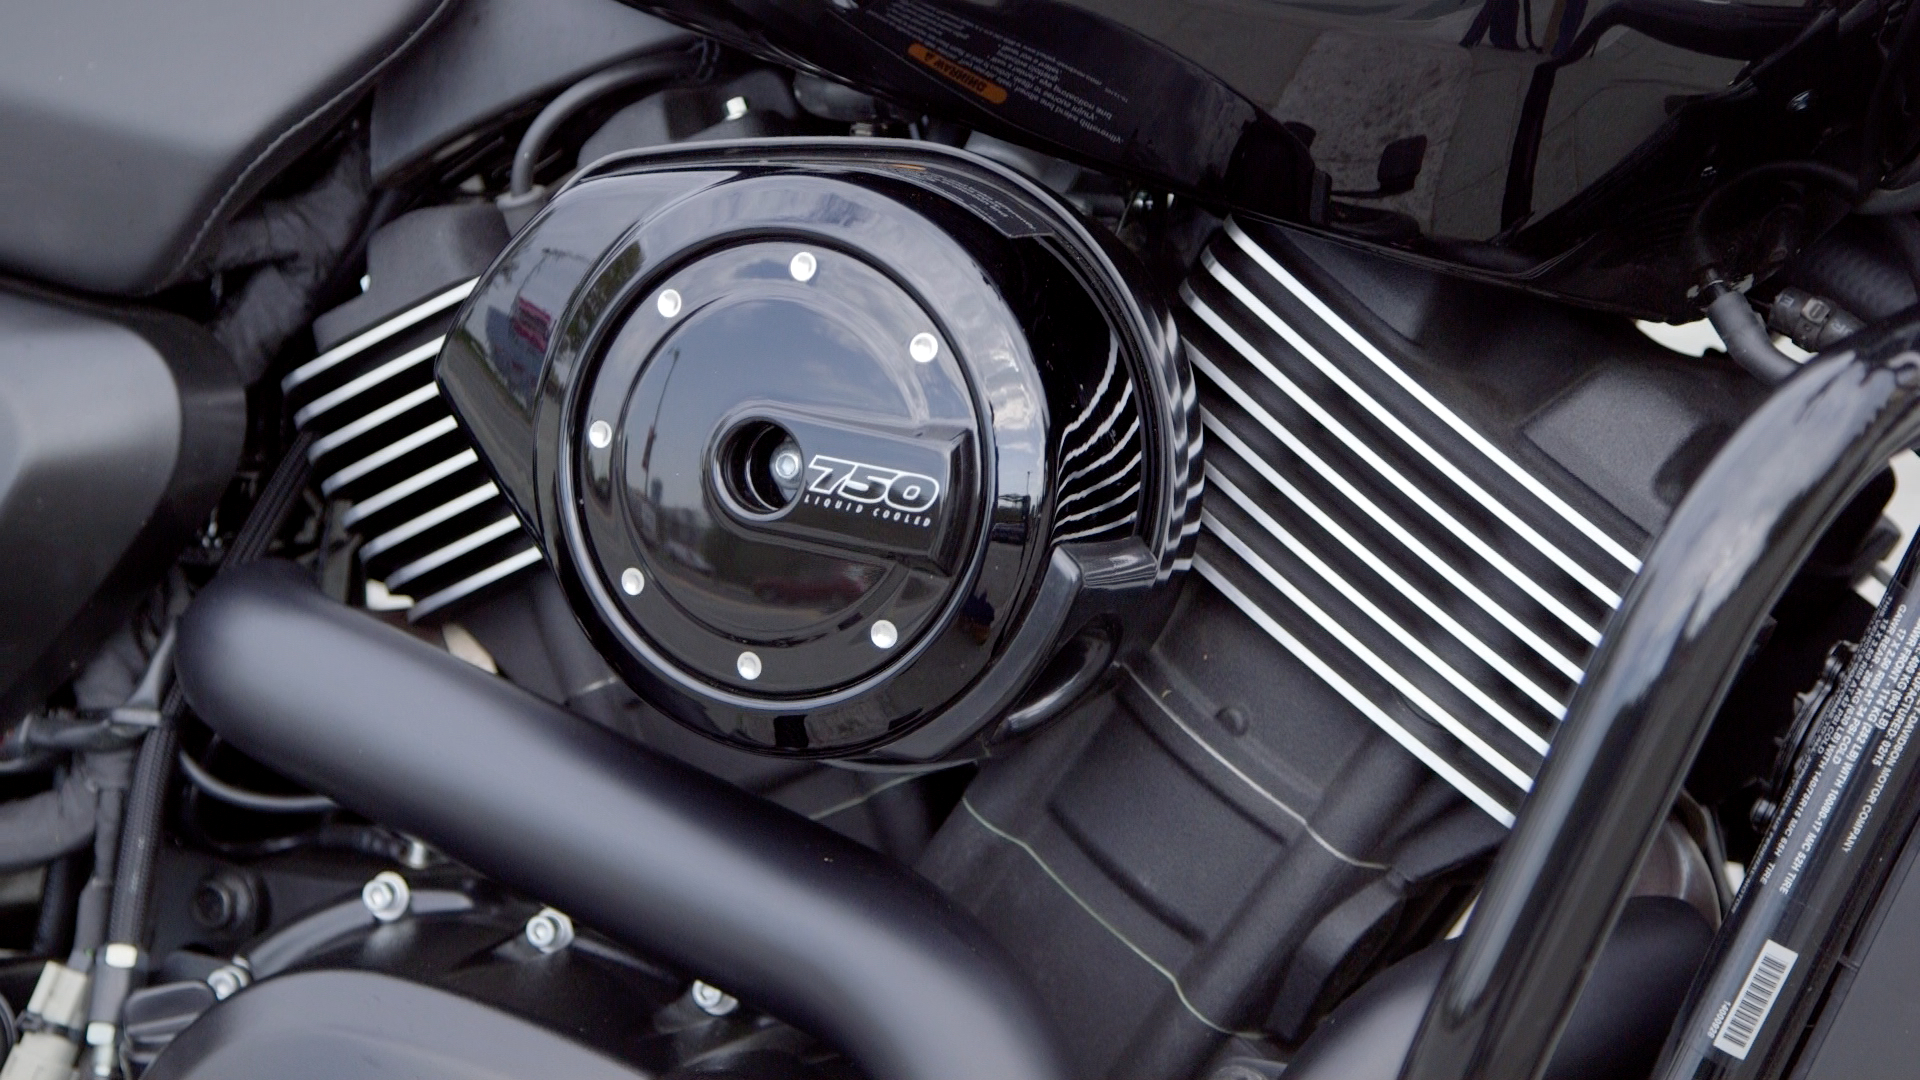 2015 Harley-Davidson Street 750 review - RevZilla